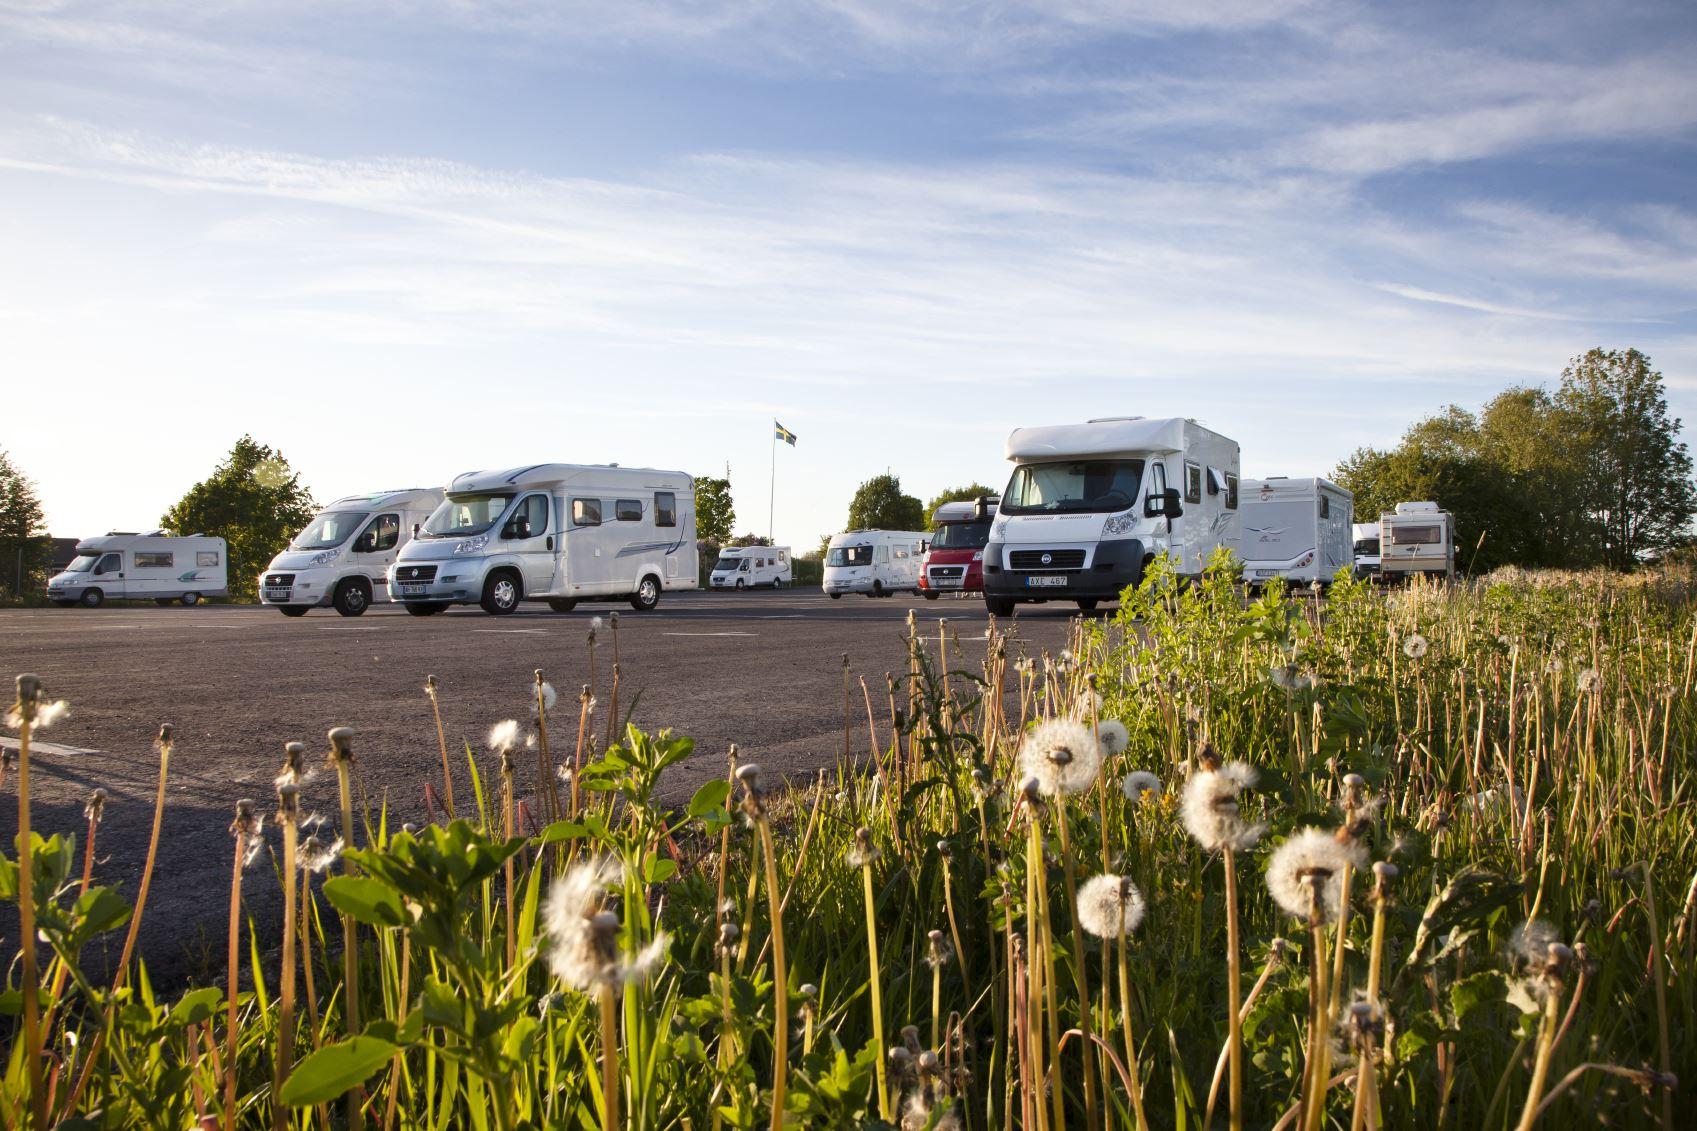 Nordic Camping Citycampstockholm/Camping